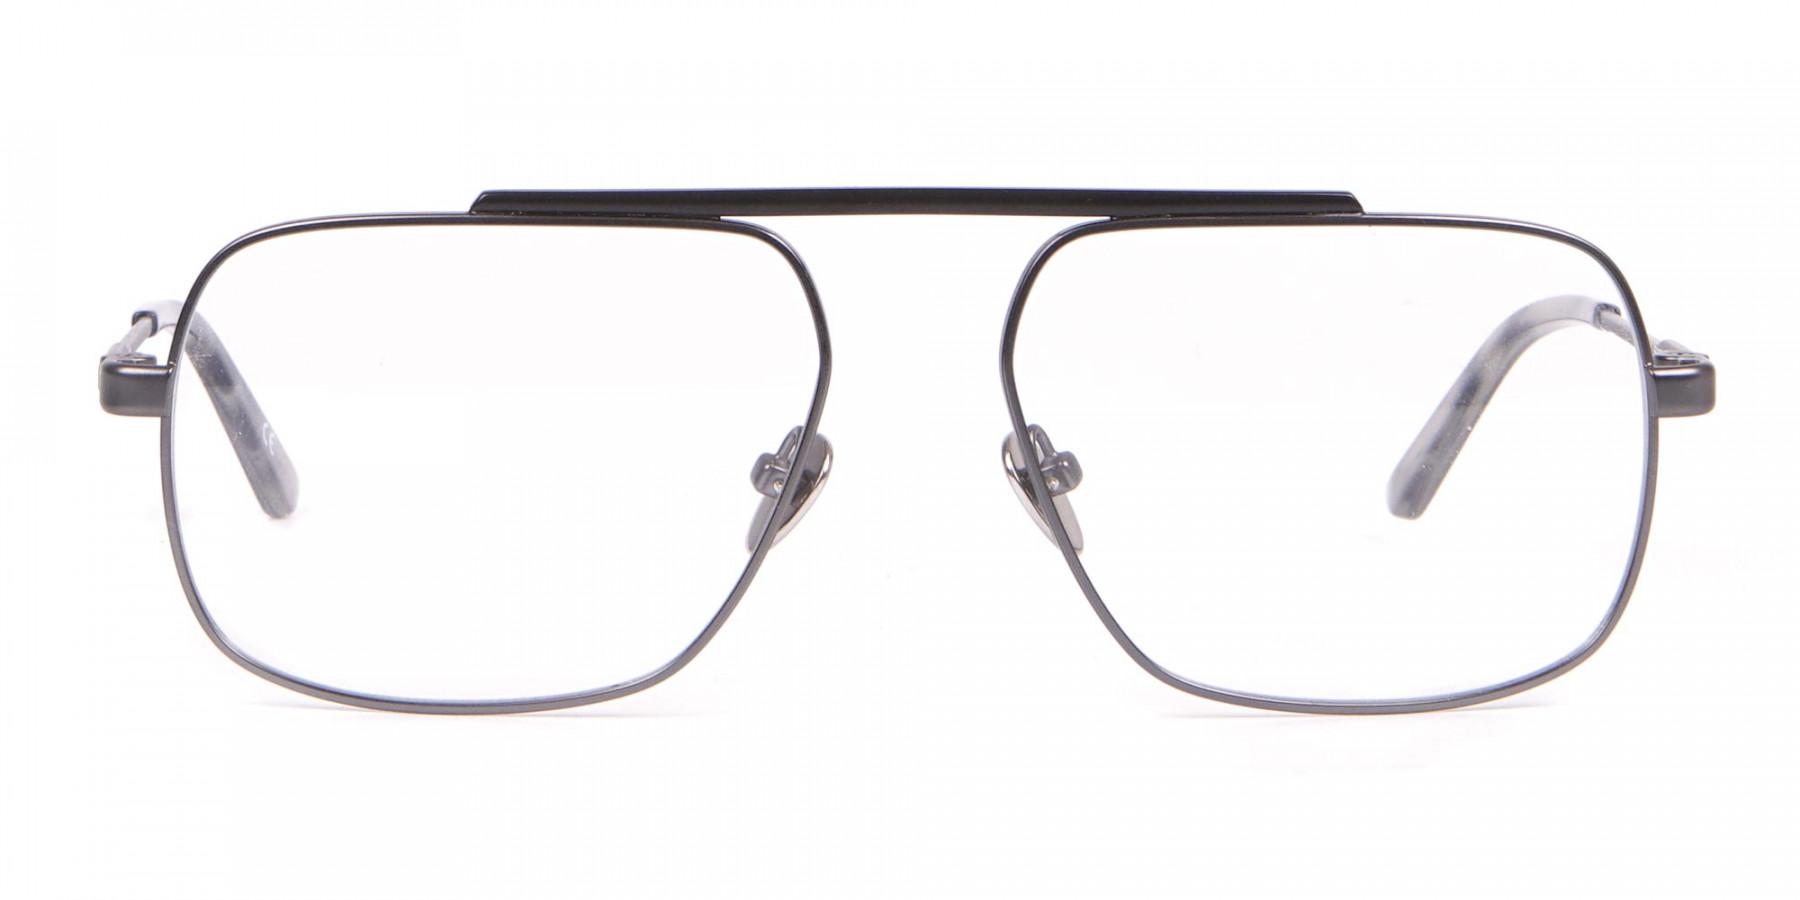 Calvin Klein CK18106 Black & Gun Metal Glasses Rectangular-1